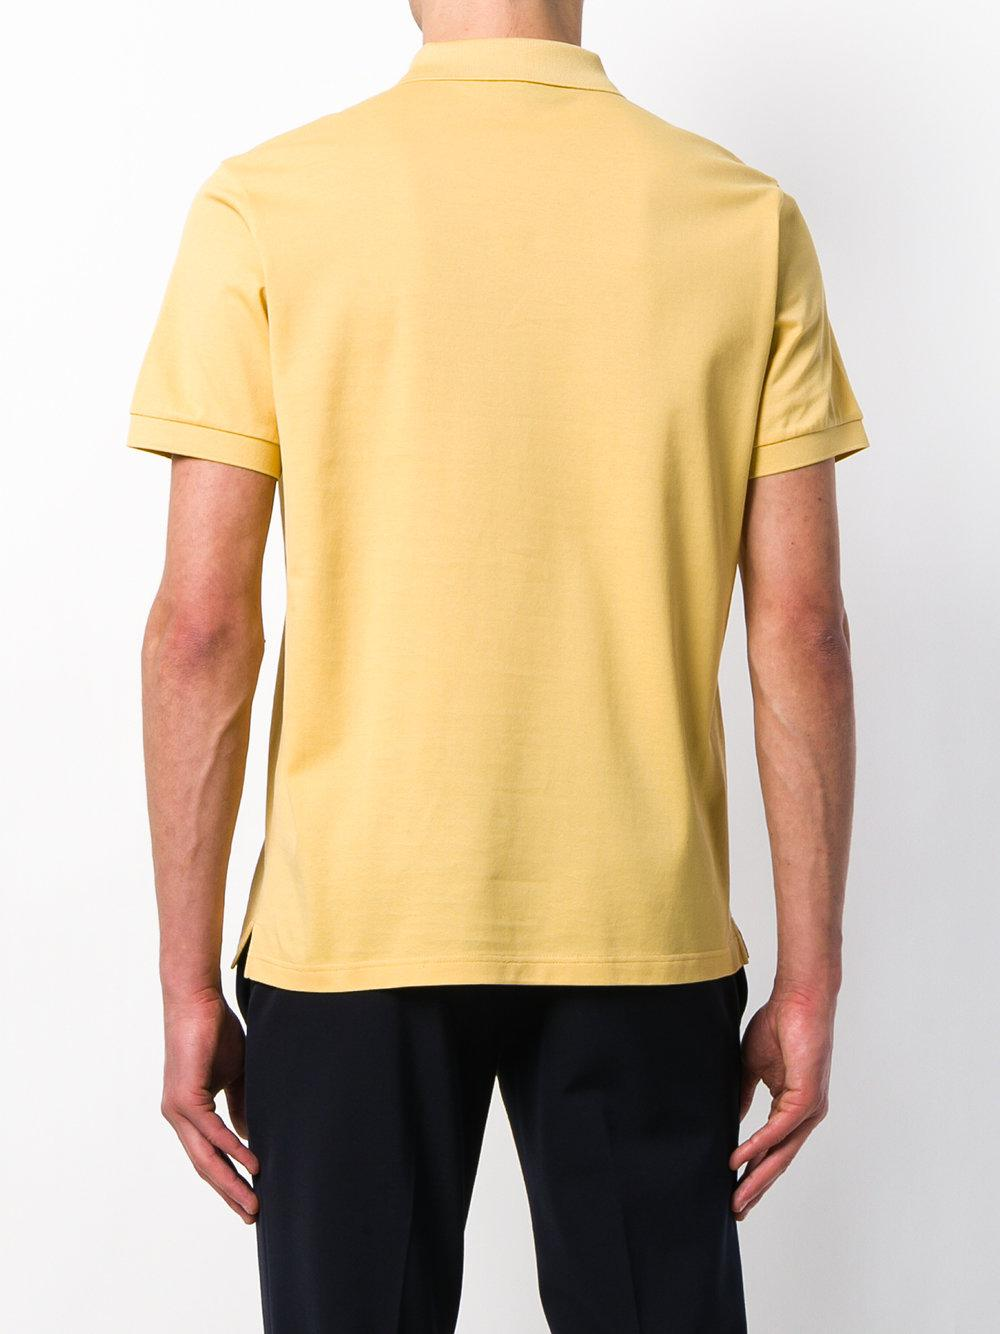 Prada Classic Polo Shirt in Yellow & Orange (Yellow) for Men